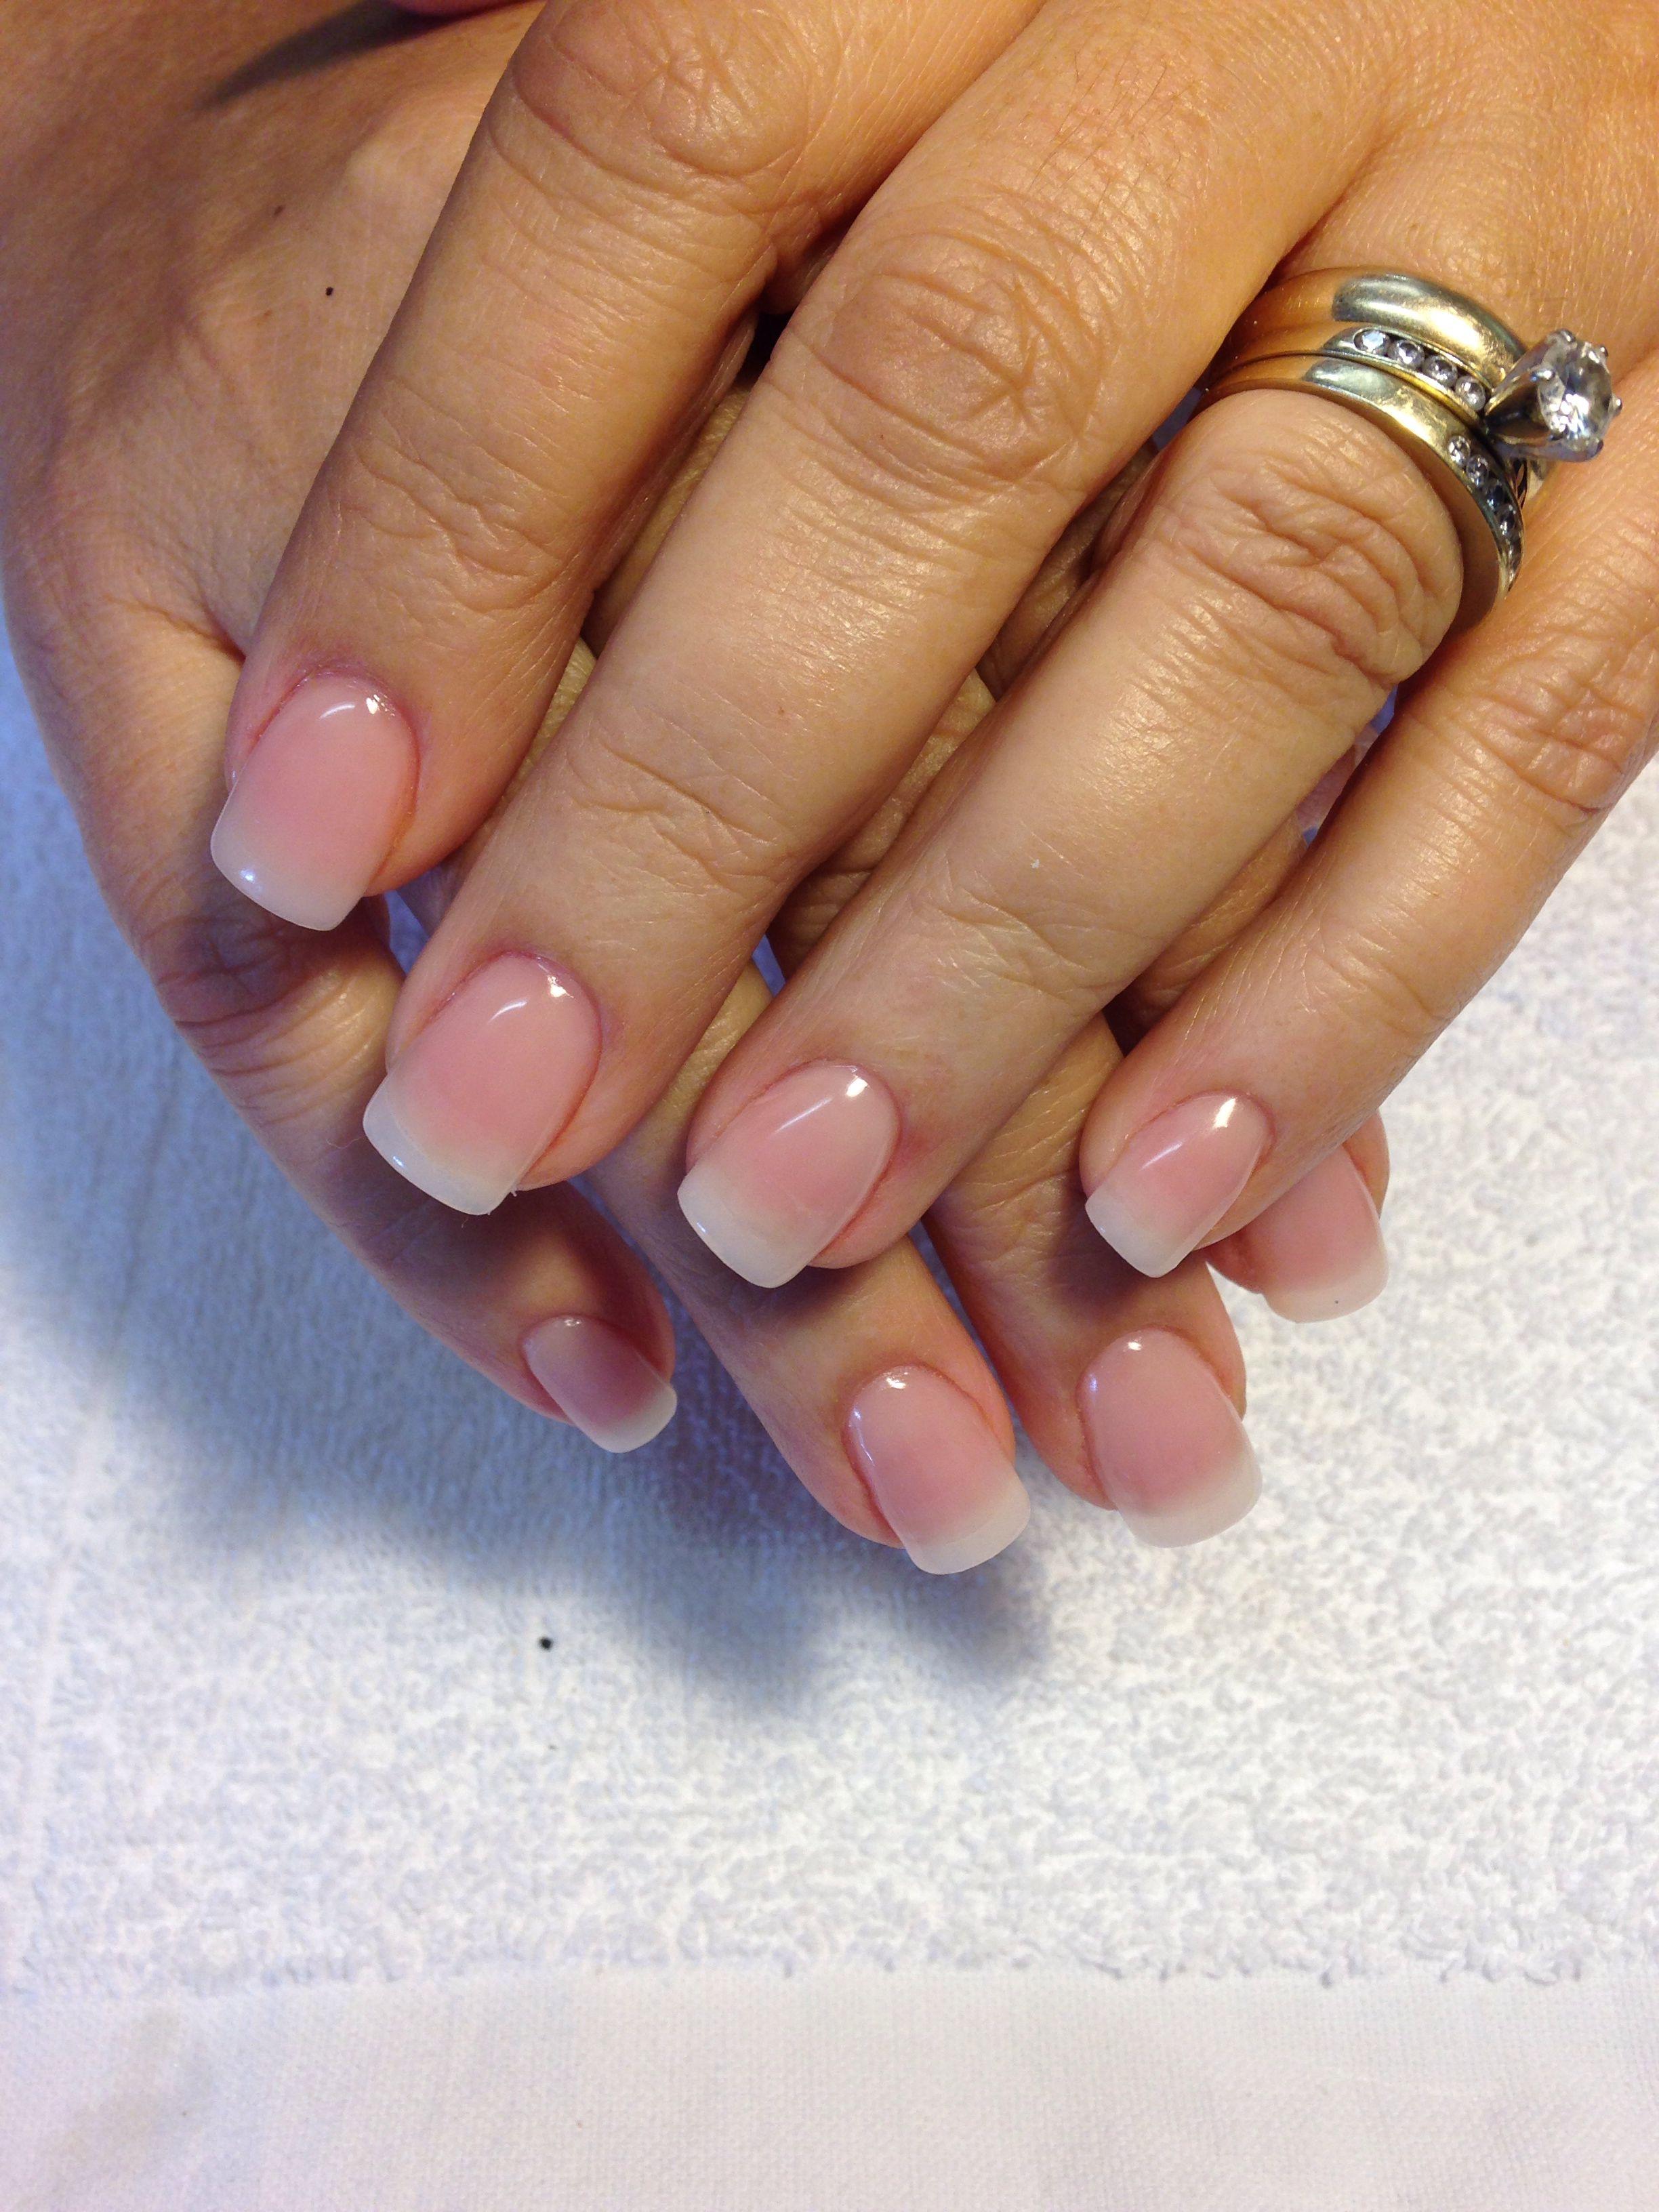 Most Natural Looking Artificial Nails